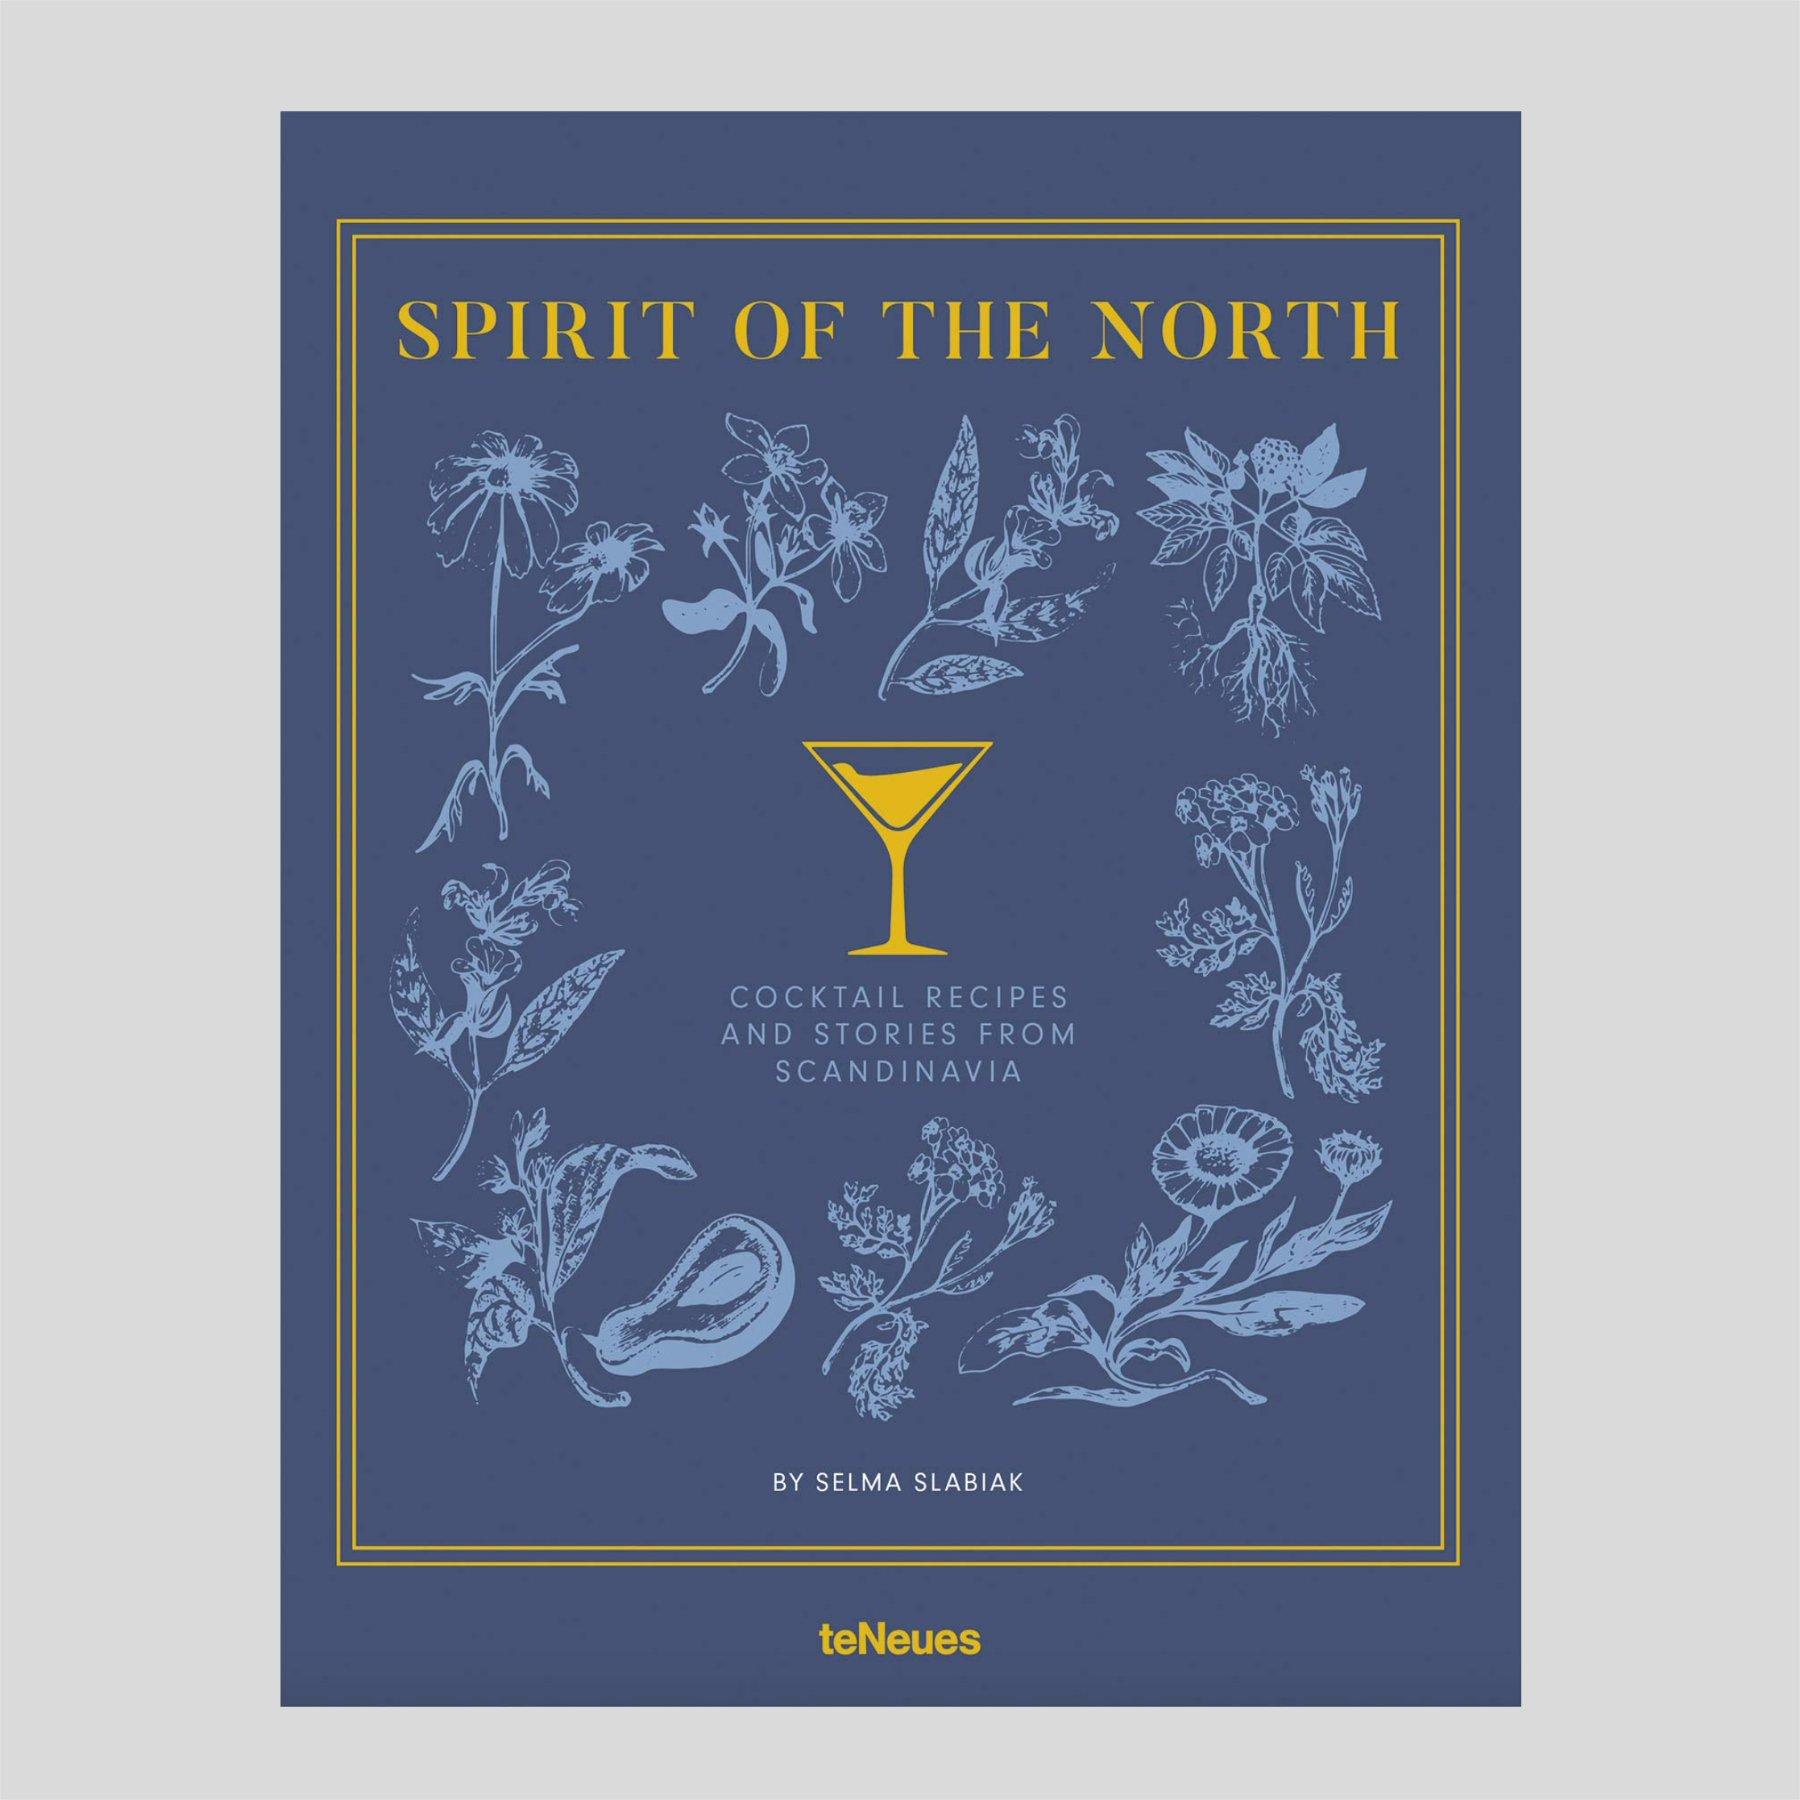 spiritsnorth nordic drinks book home